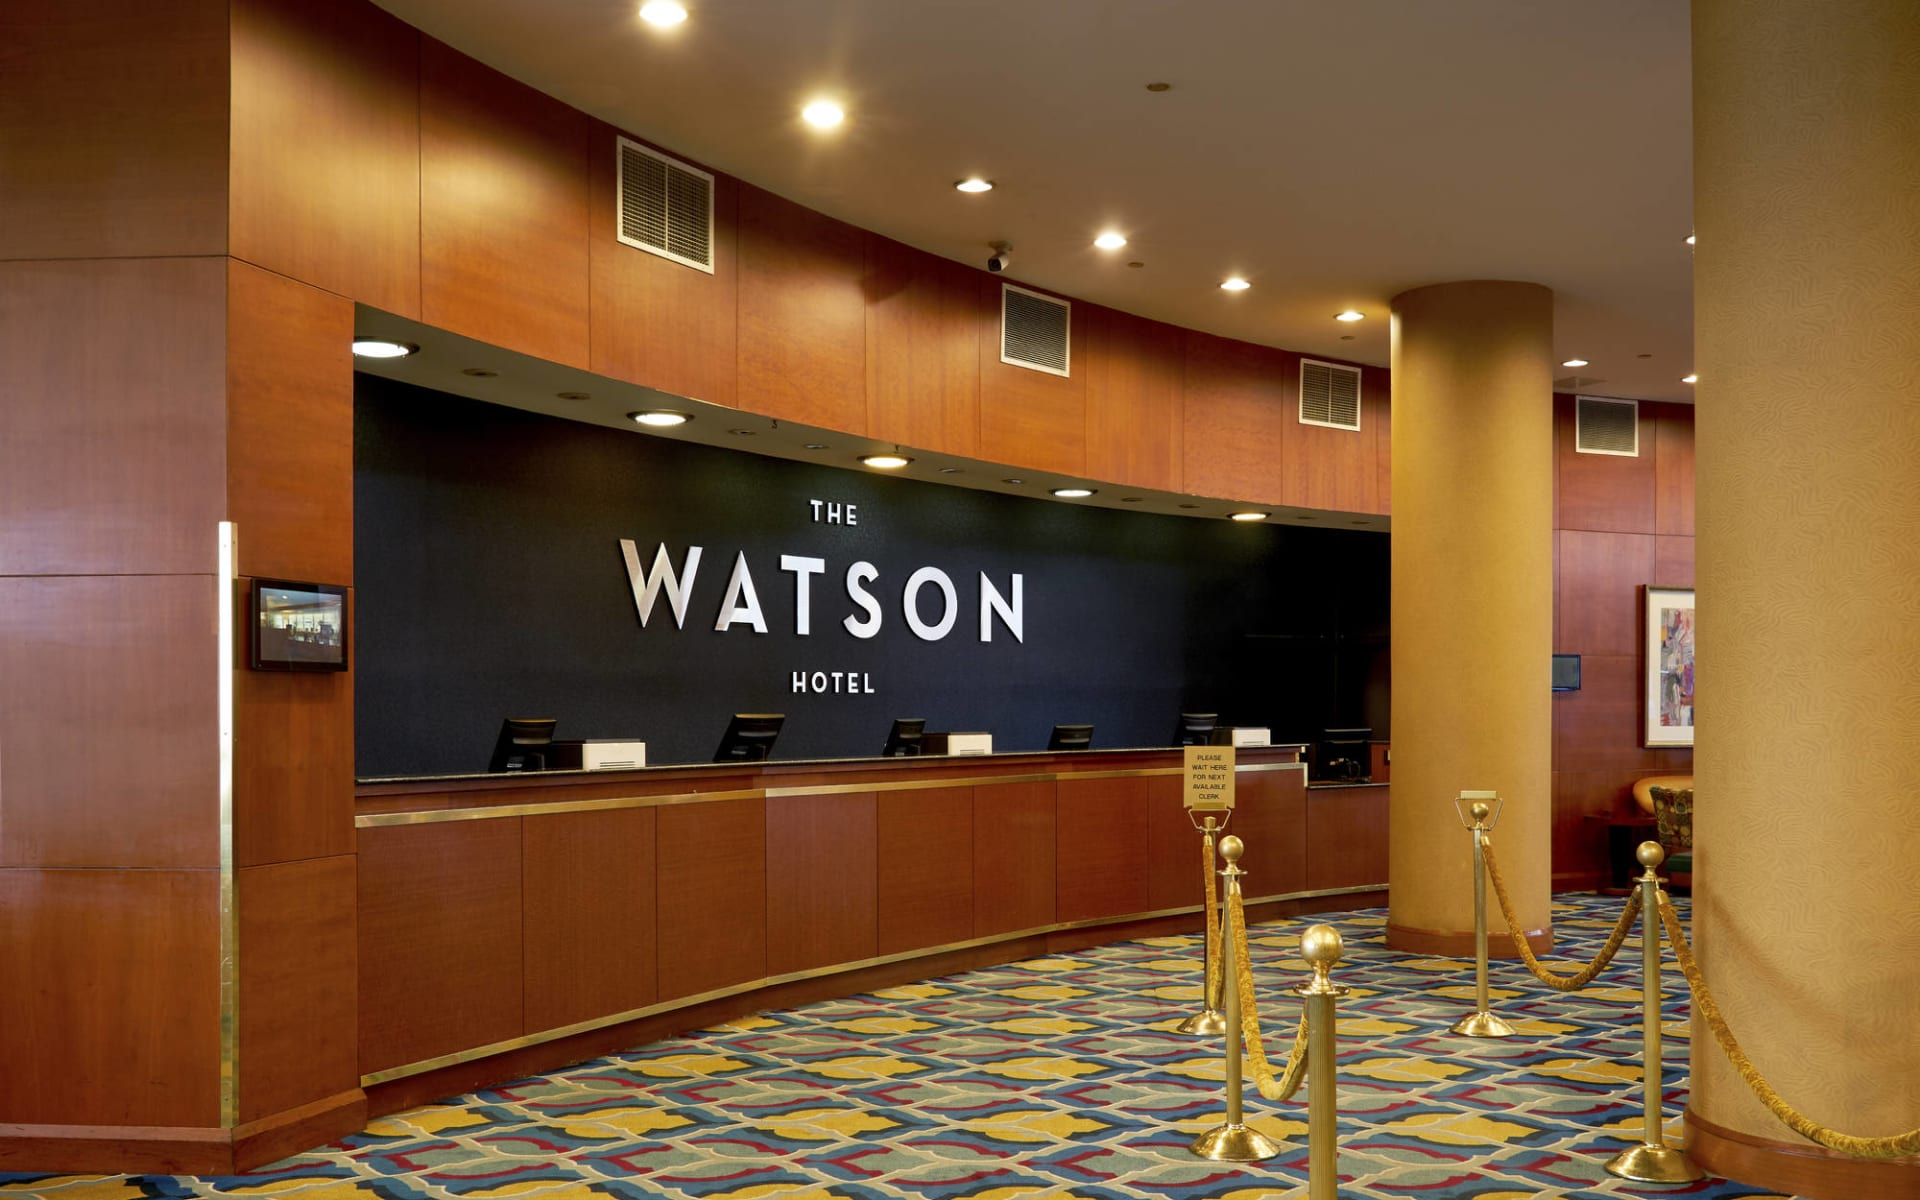 The Watson Hotel in New York - Manhattan:  The Watson - Front Desk